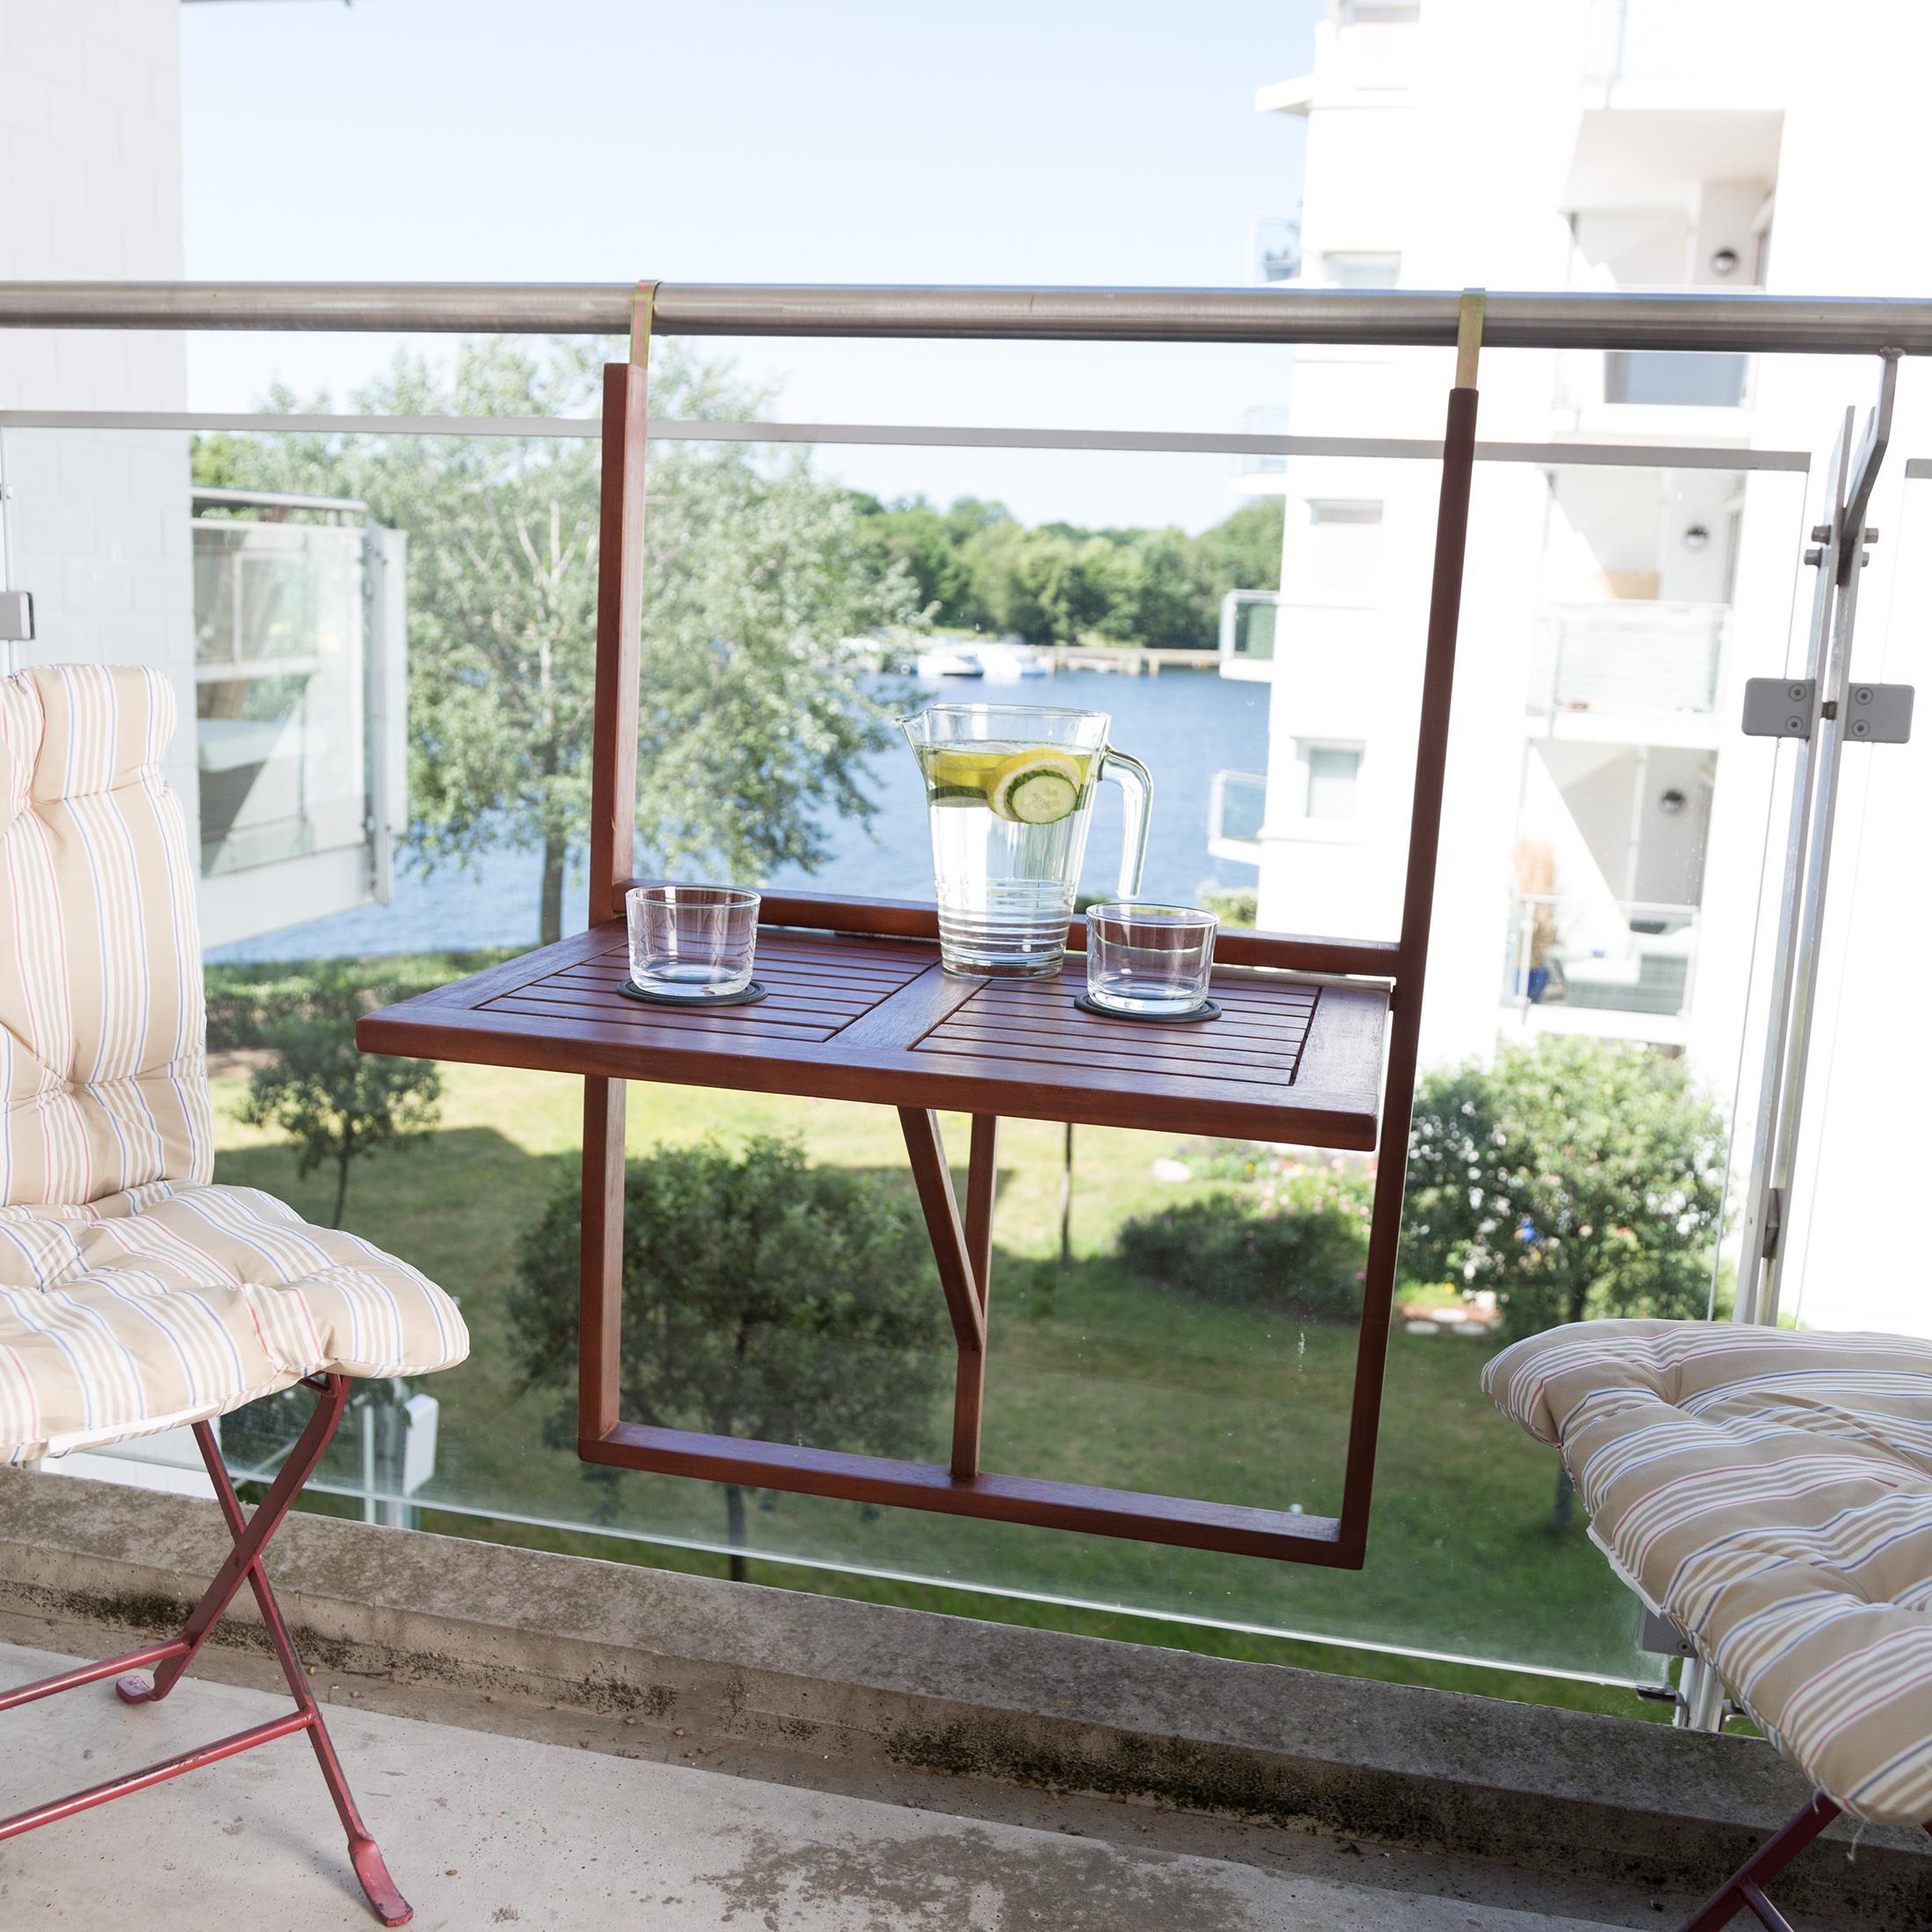 ultranatura table de balcon table suspendue en bois rabattable gamme canberra jardin. Black Bedroom Furniture Sets. Home Design Ideas